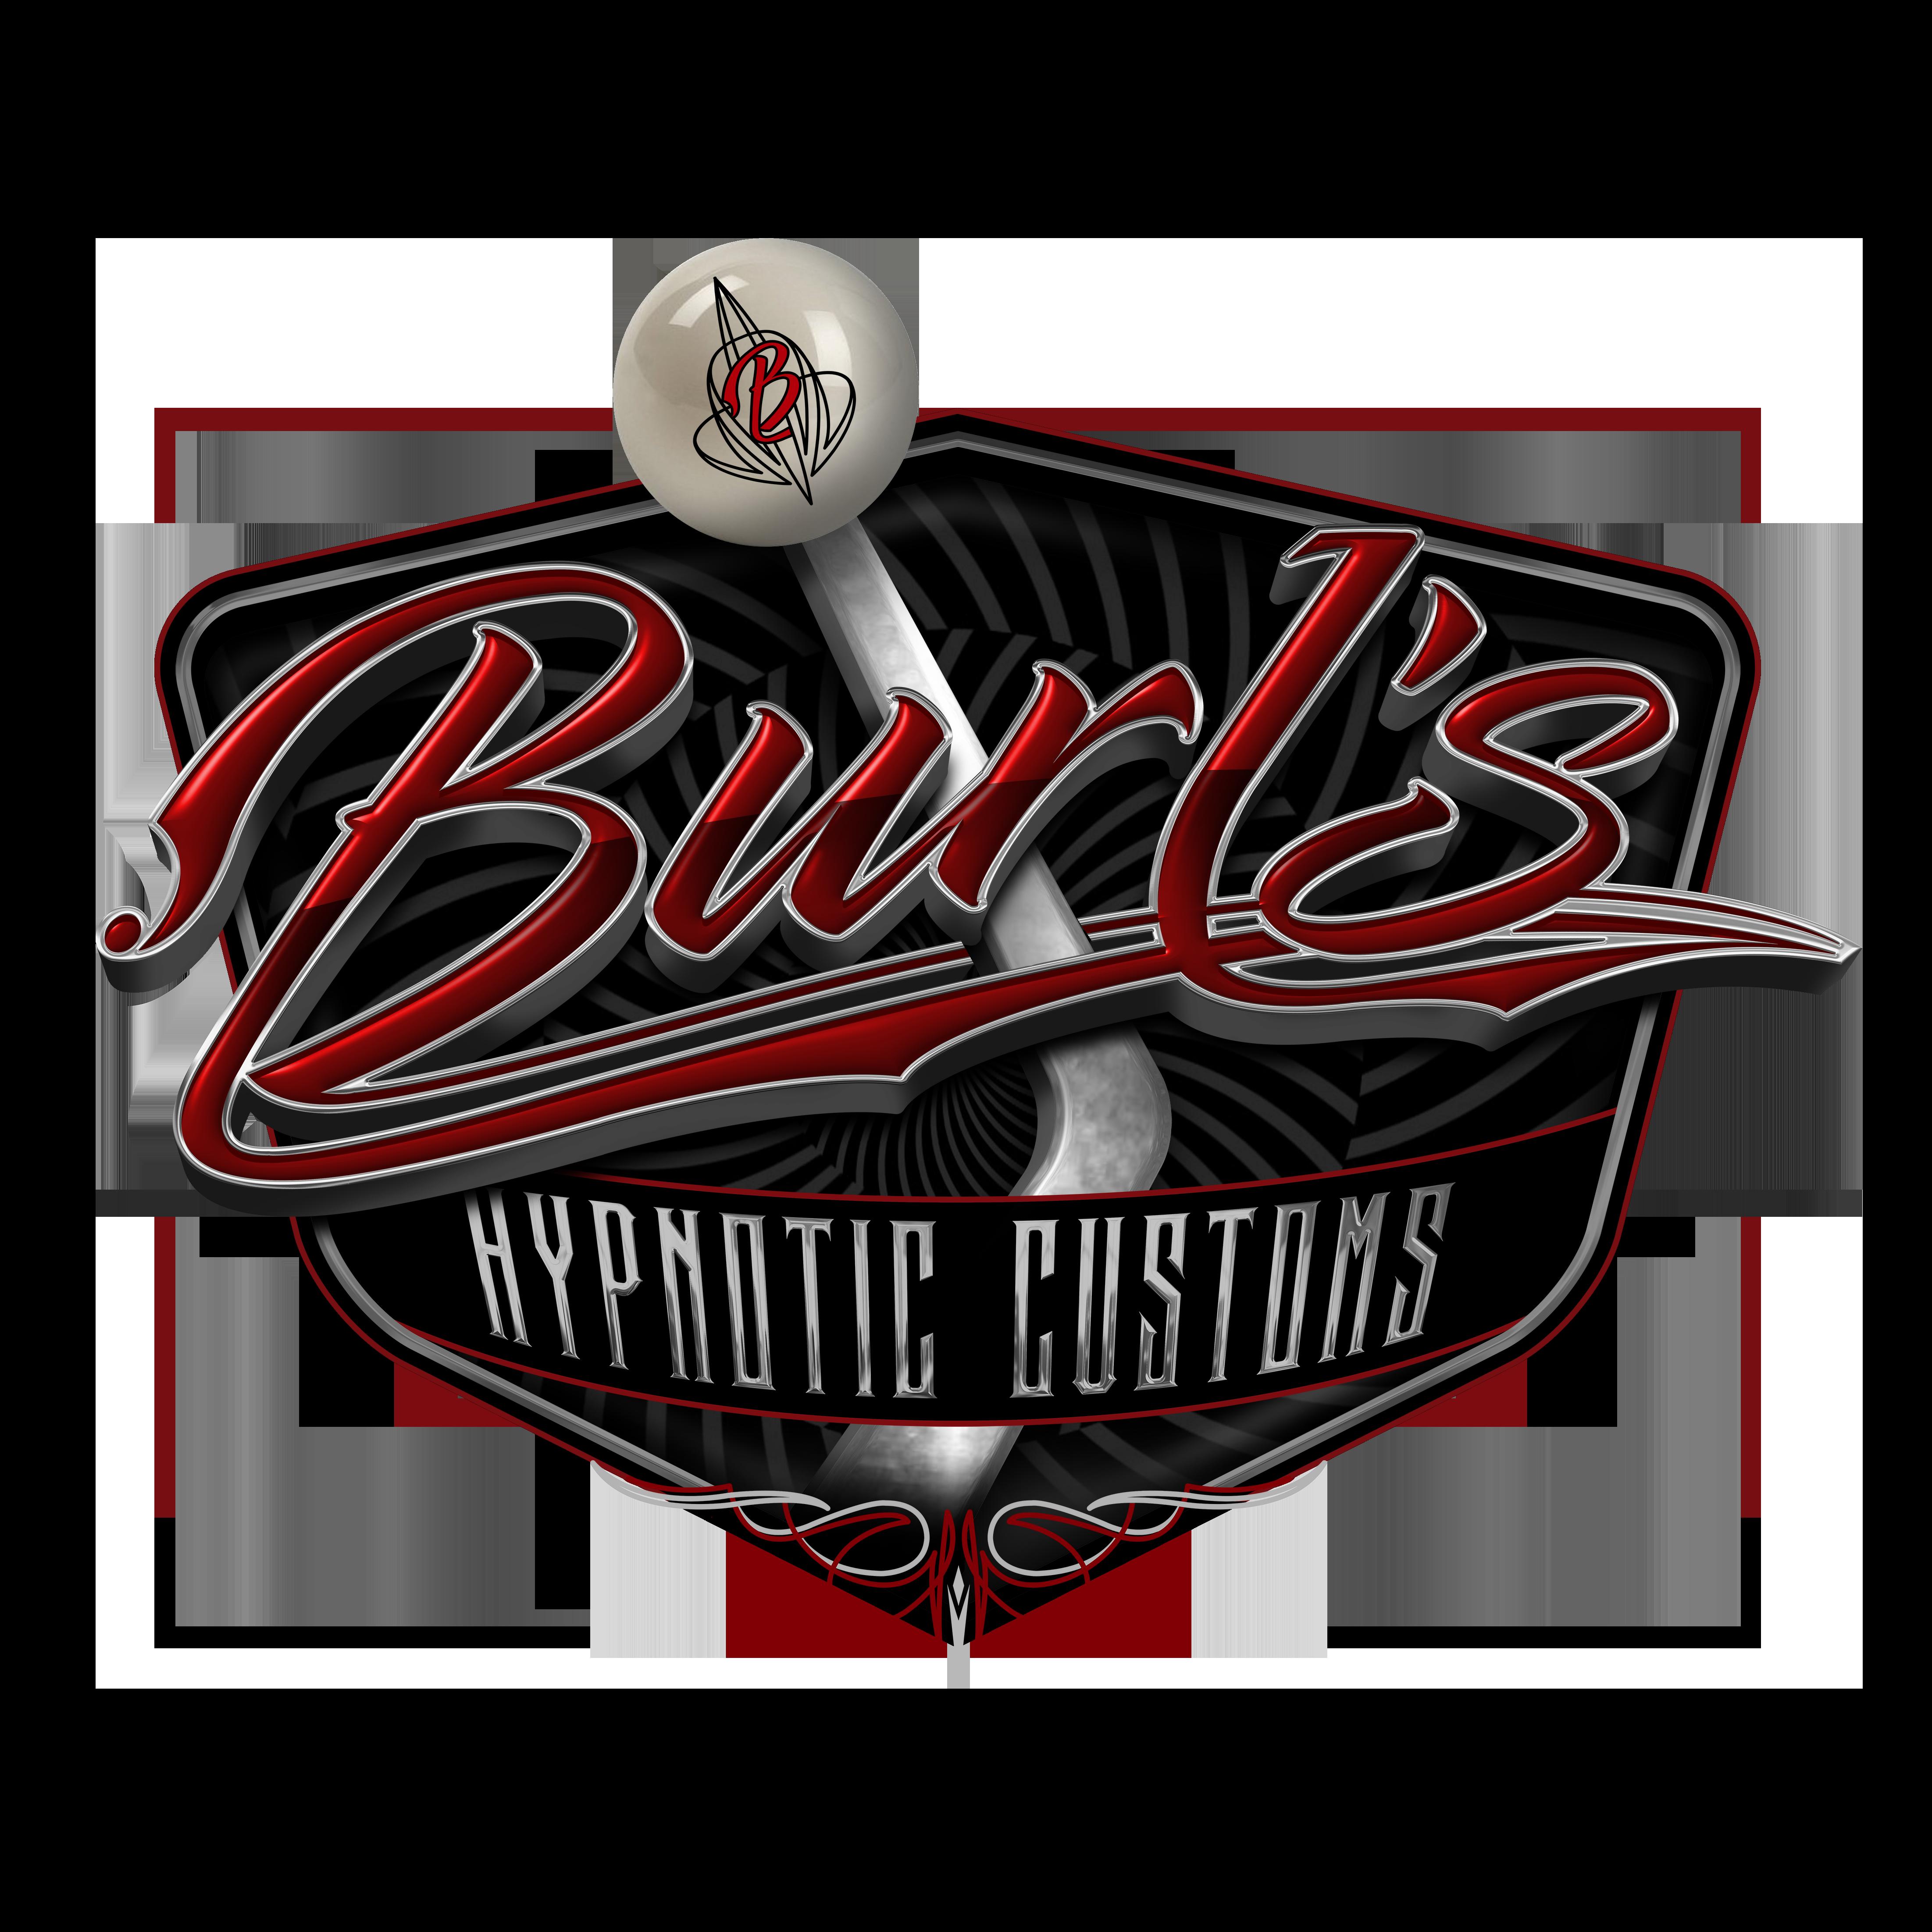 Burl's Hypnotic Customs